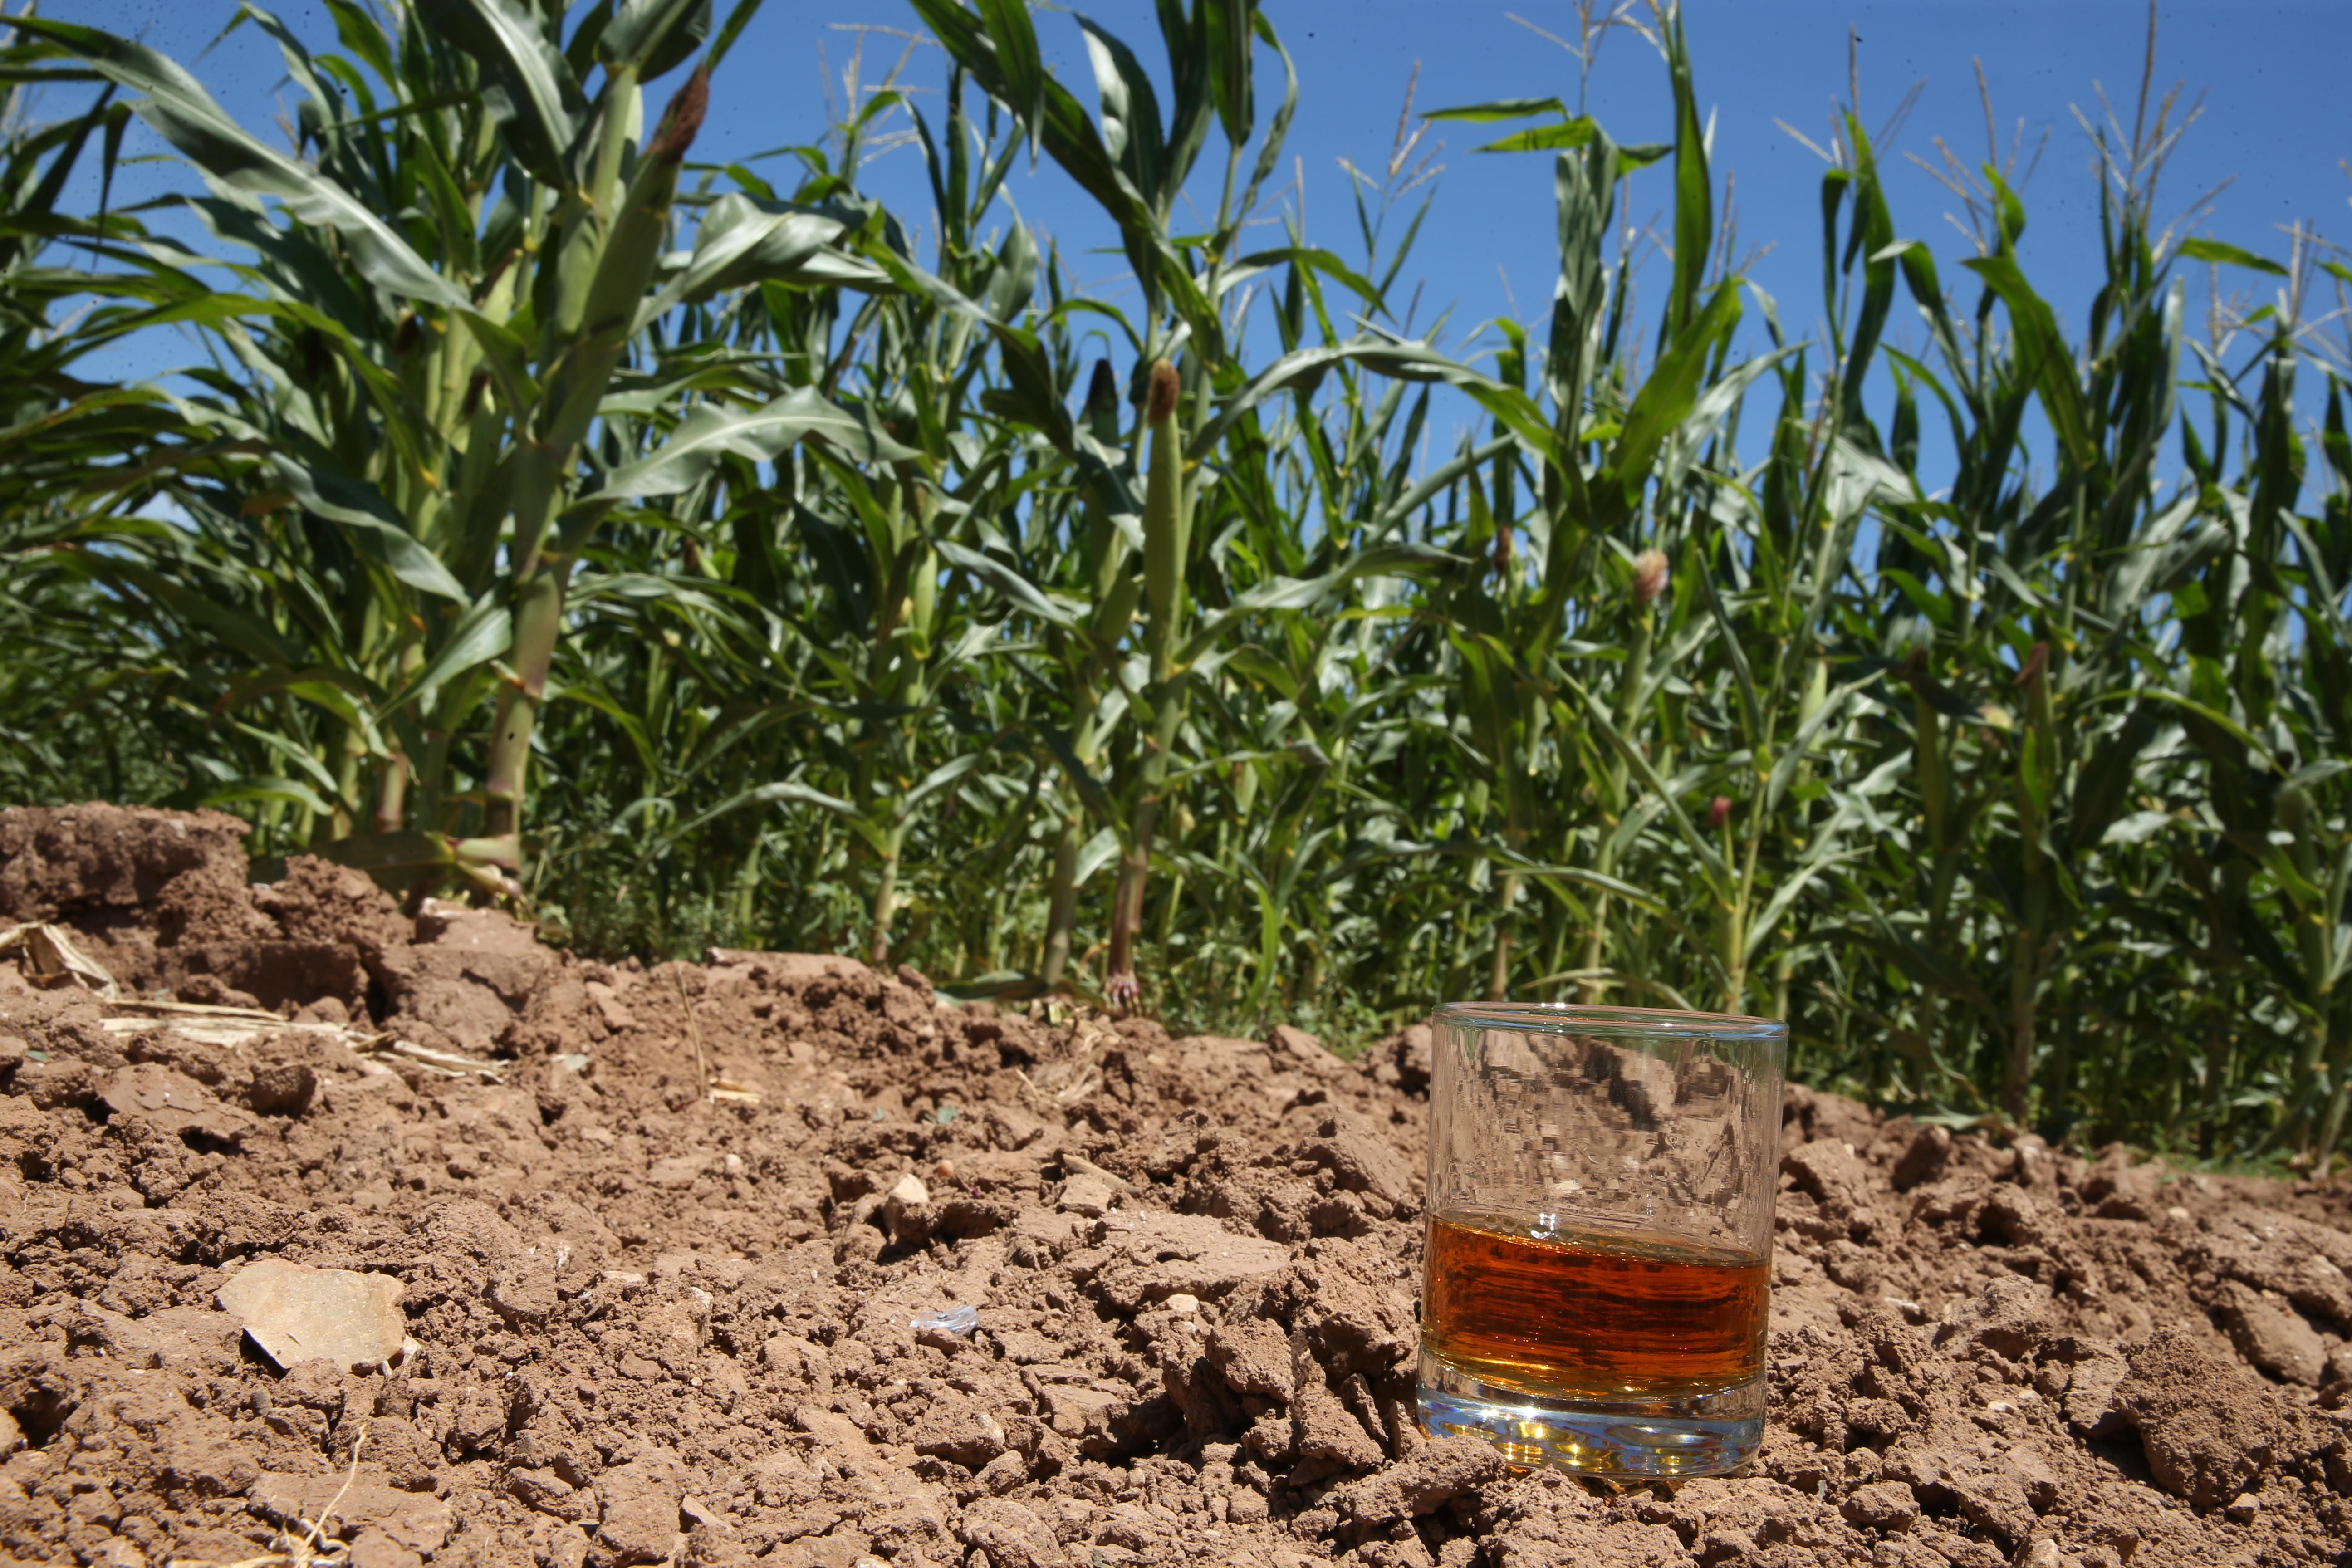 Texas corn bourbon